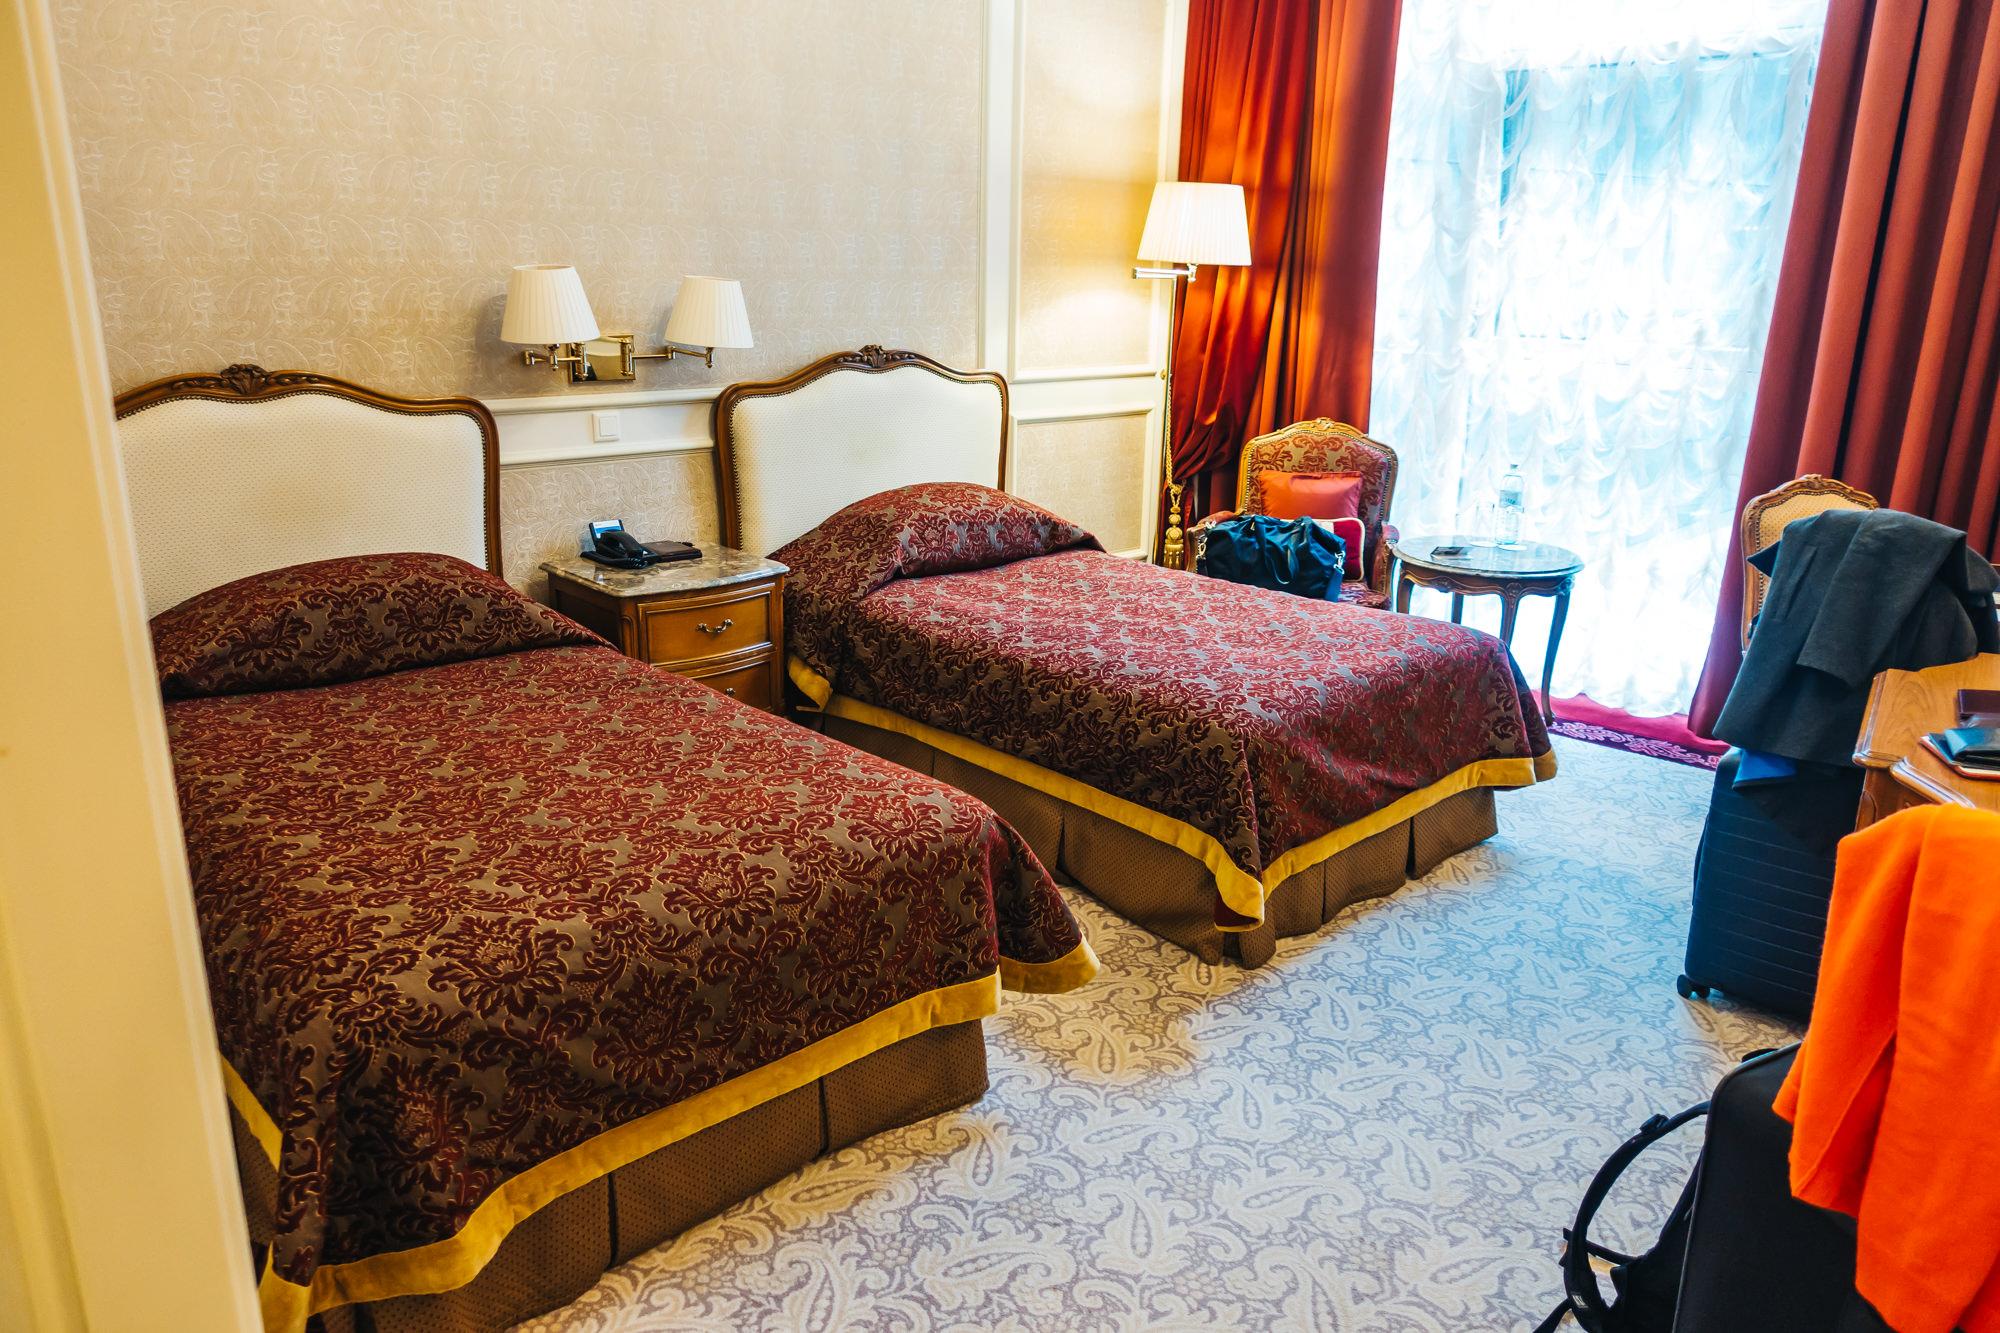 Superior room at Grand Hotel Wien in Vienna